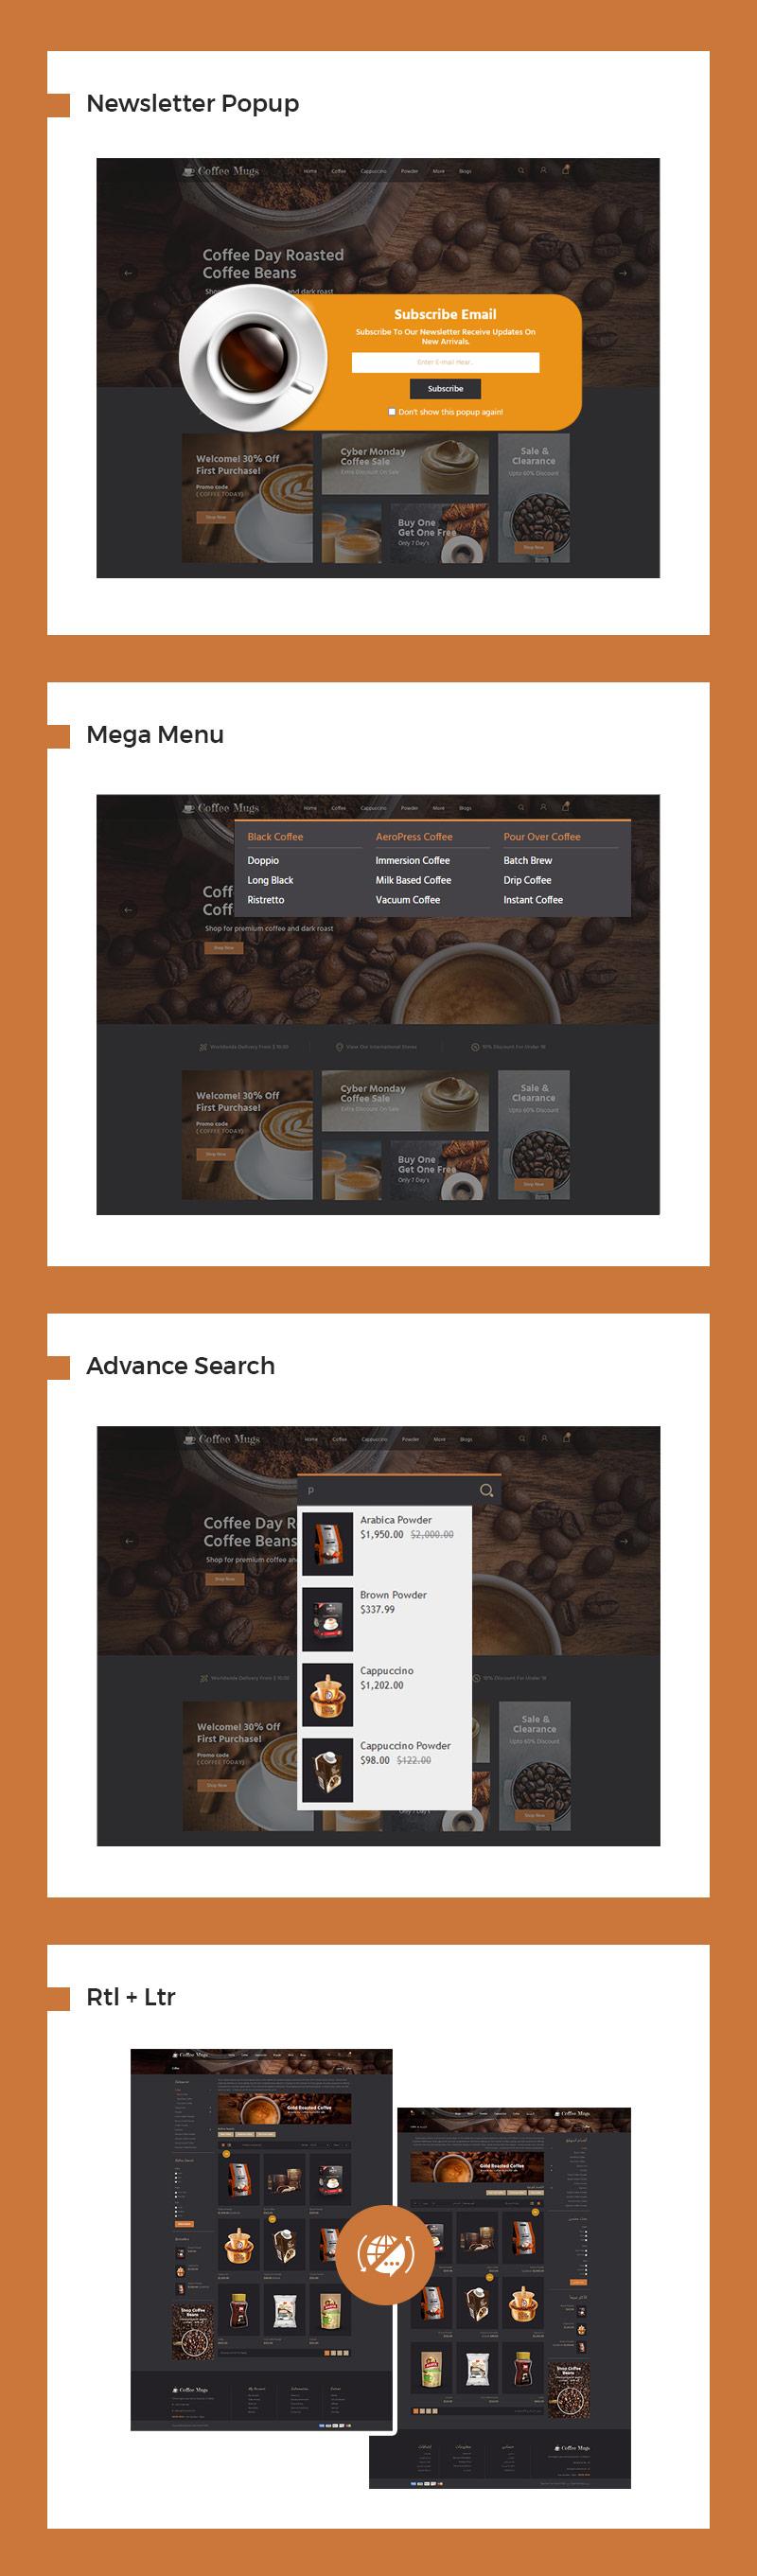 coffeemug-features-2.jpg